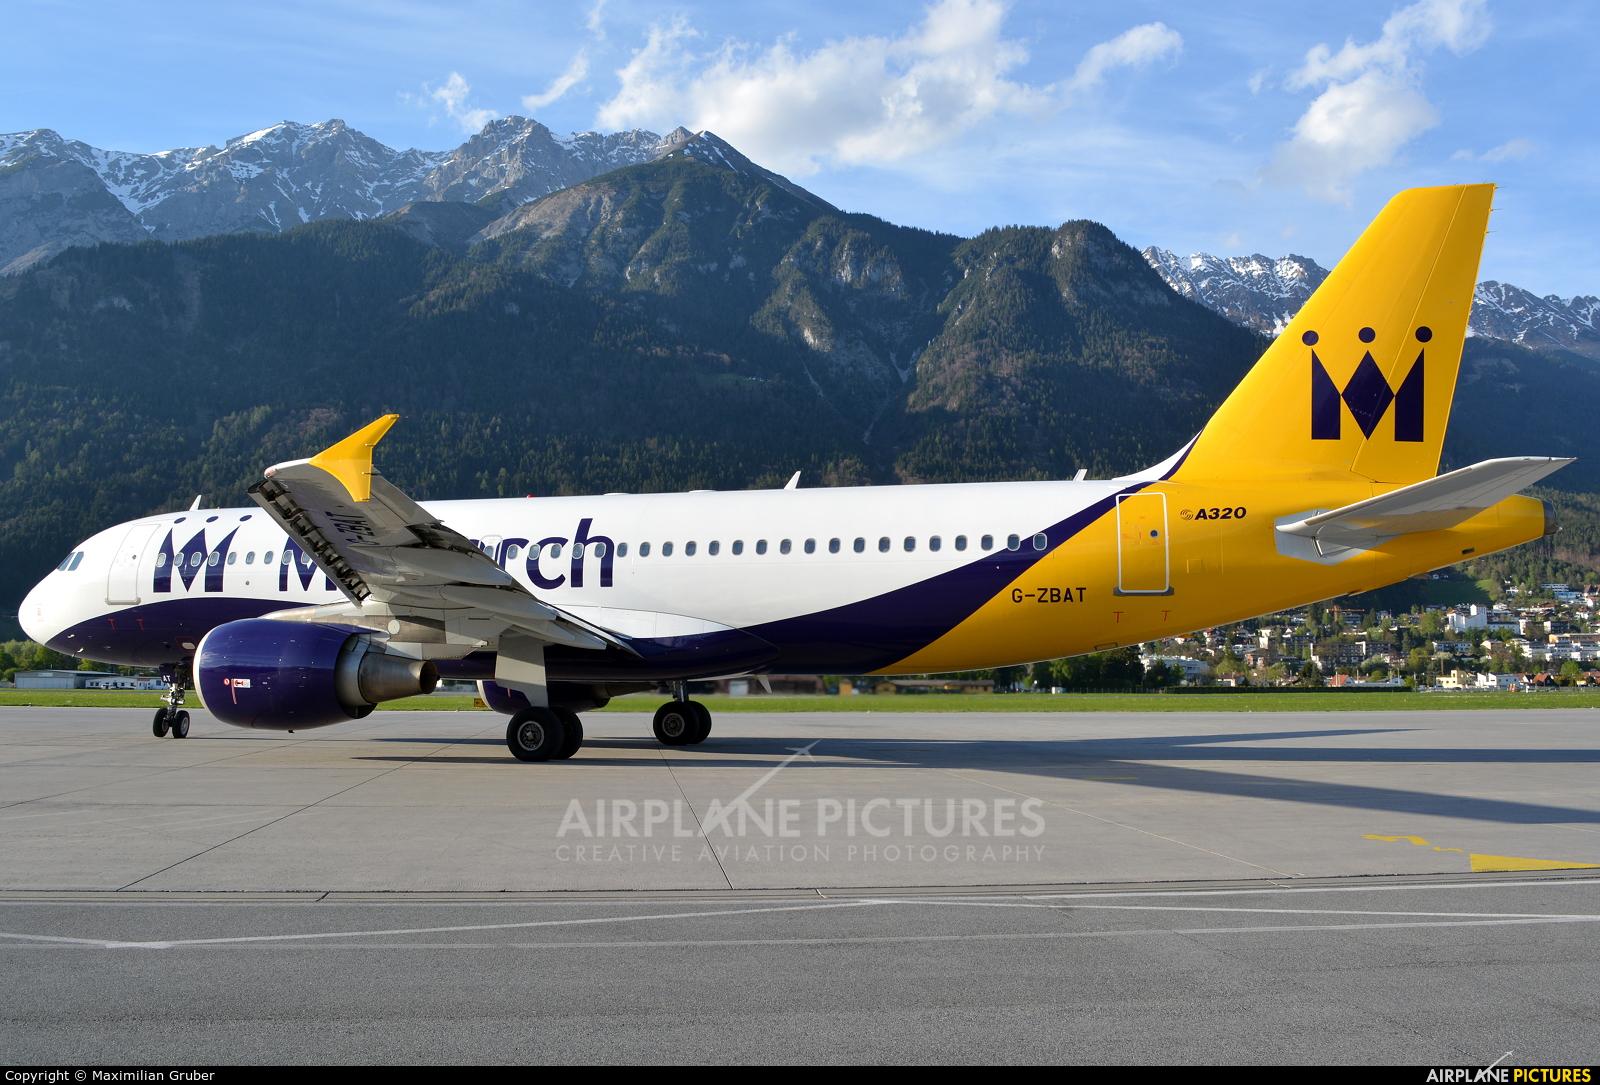 Monarch Airlines G-ZBAT aircraft at Innsbruck